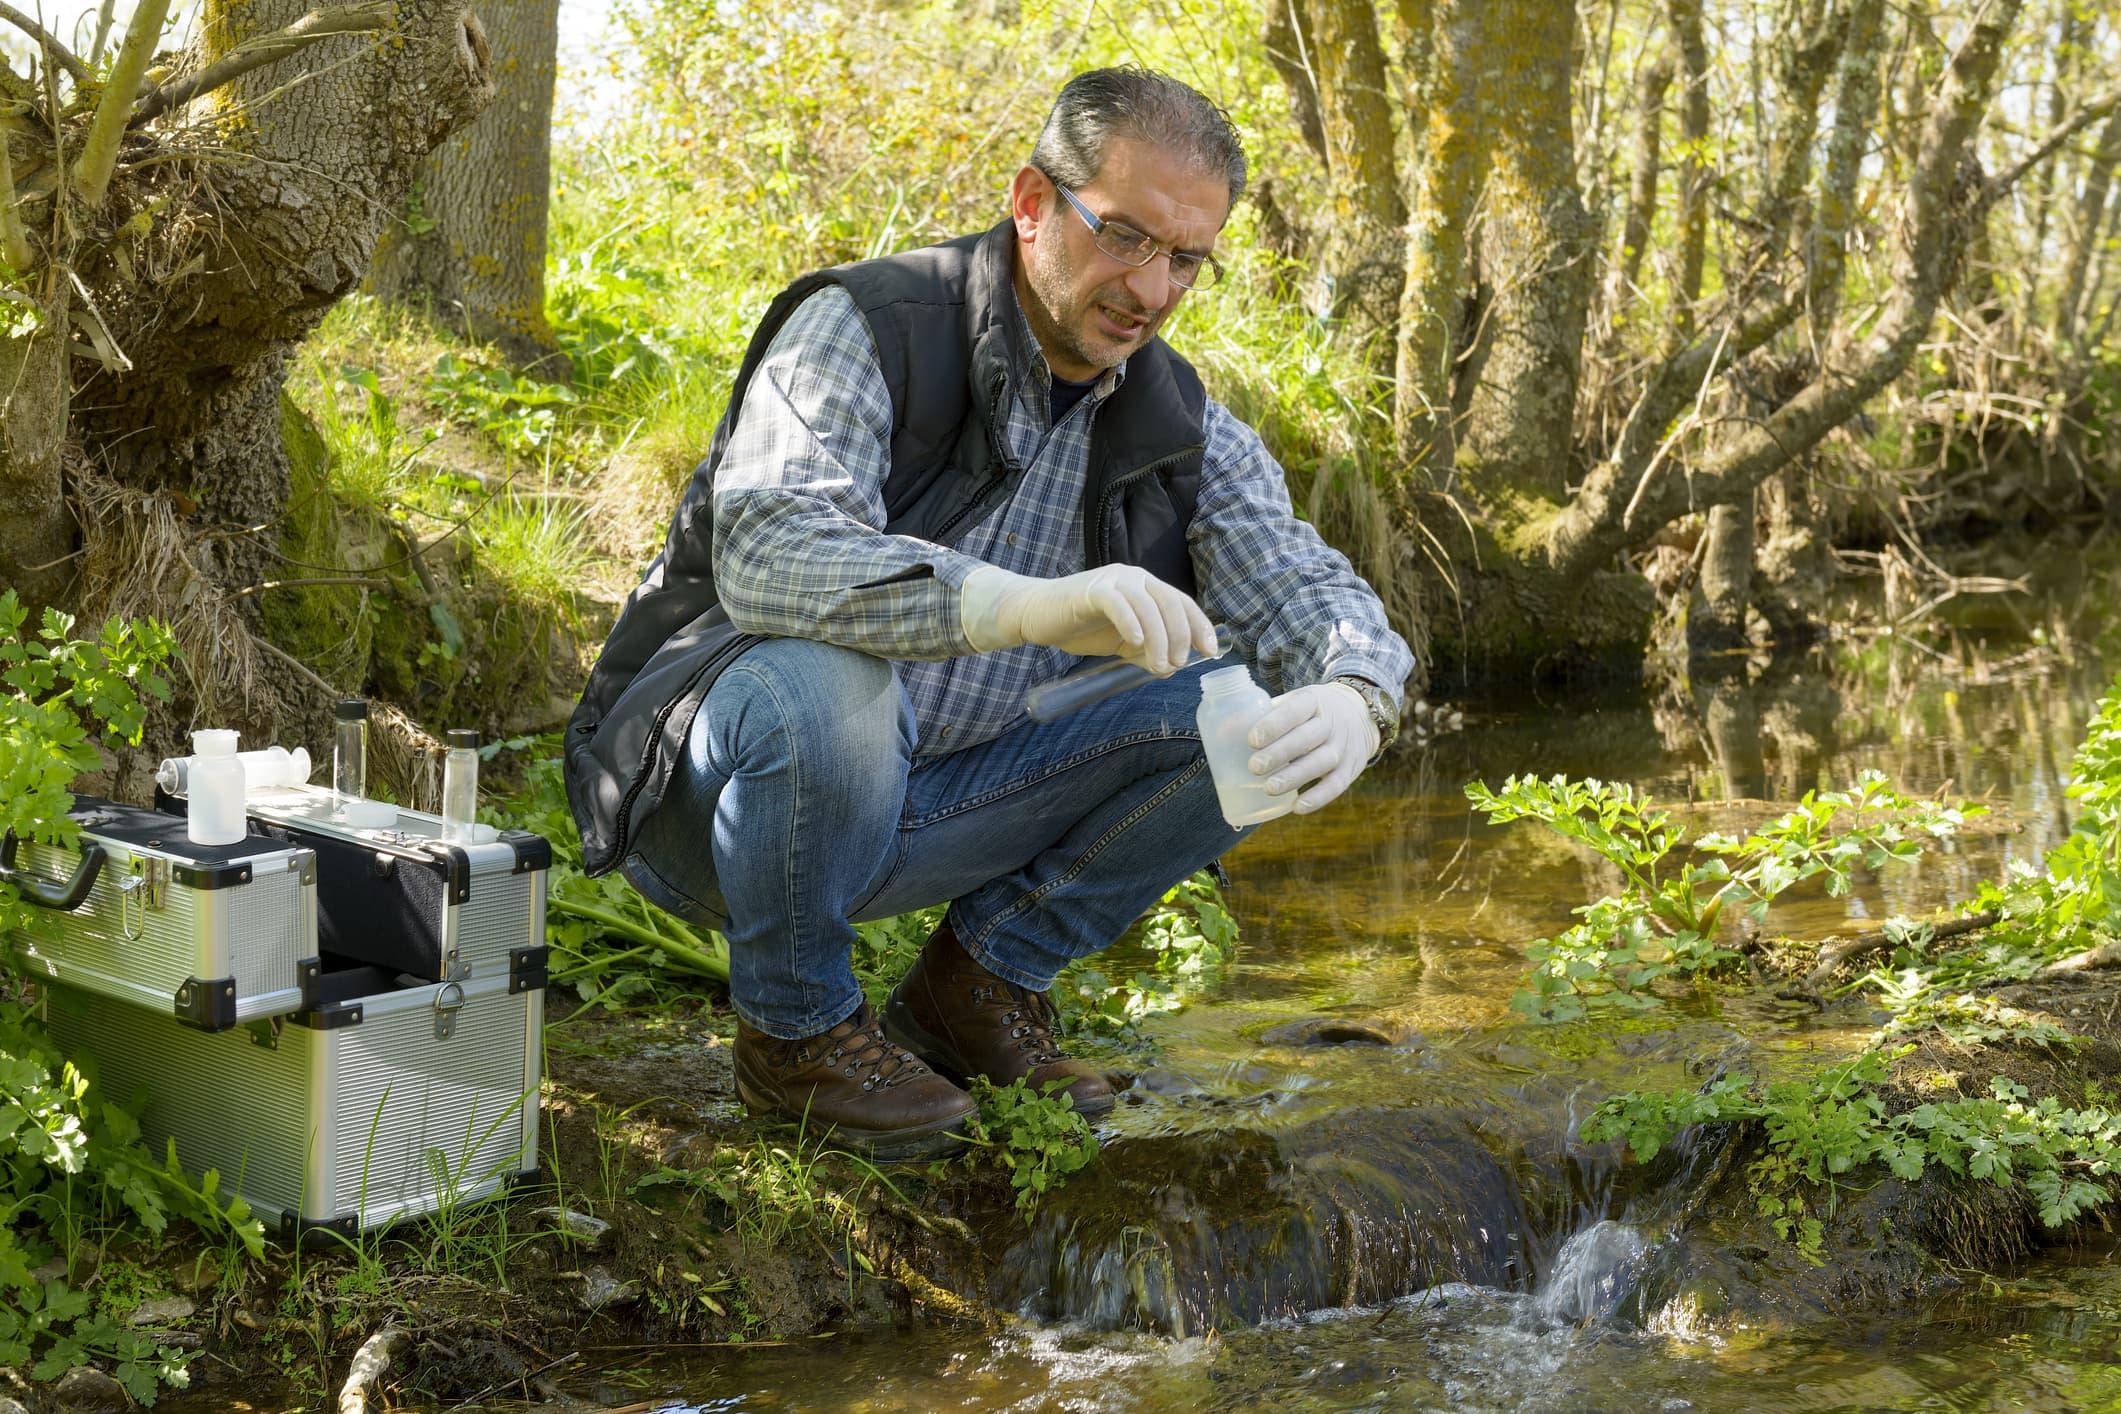 GP: Biologist take a sample in a river.